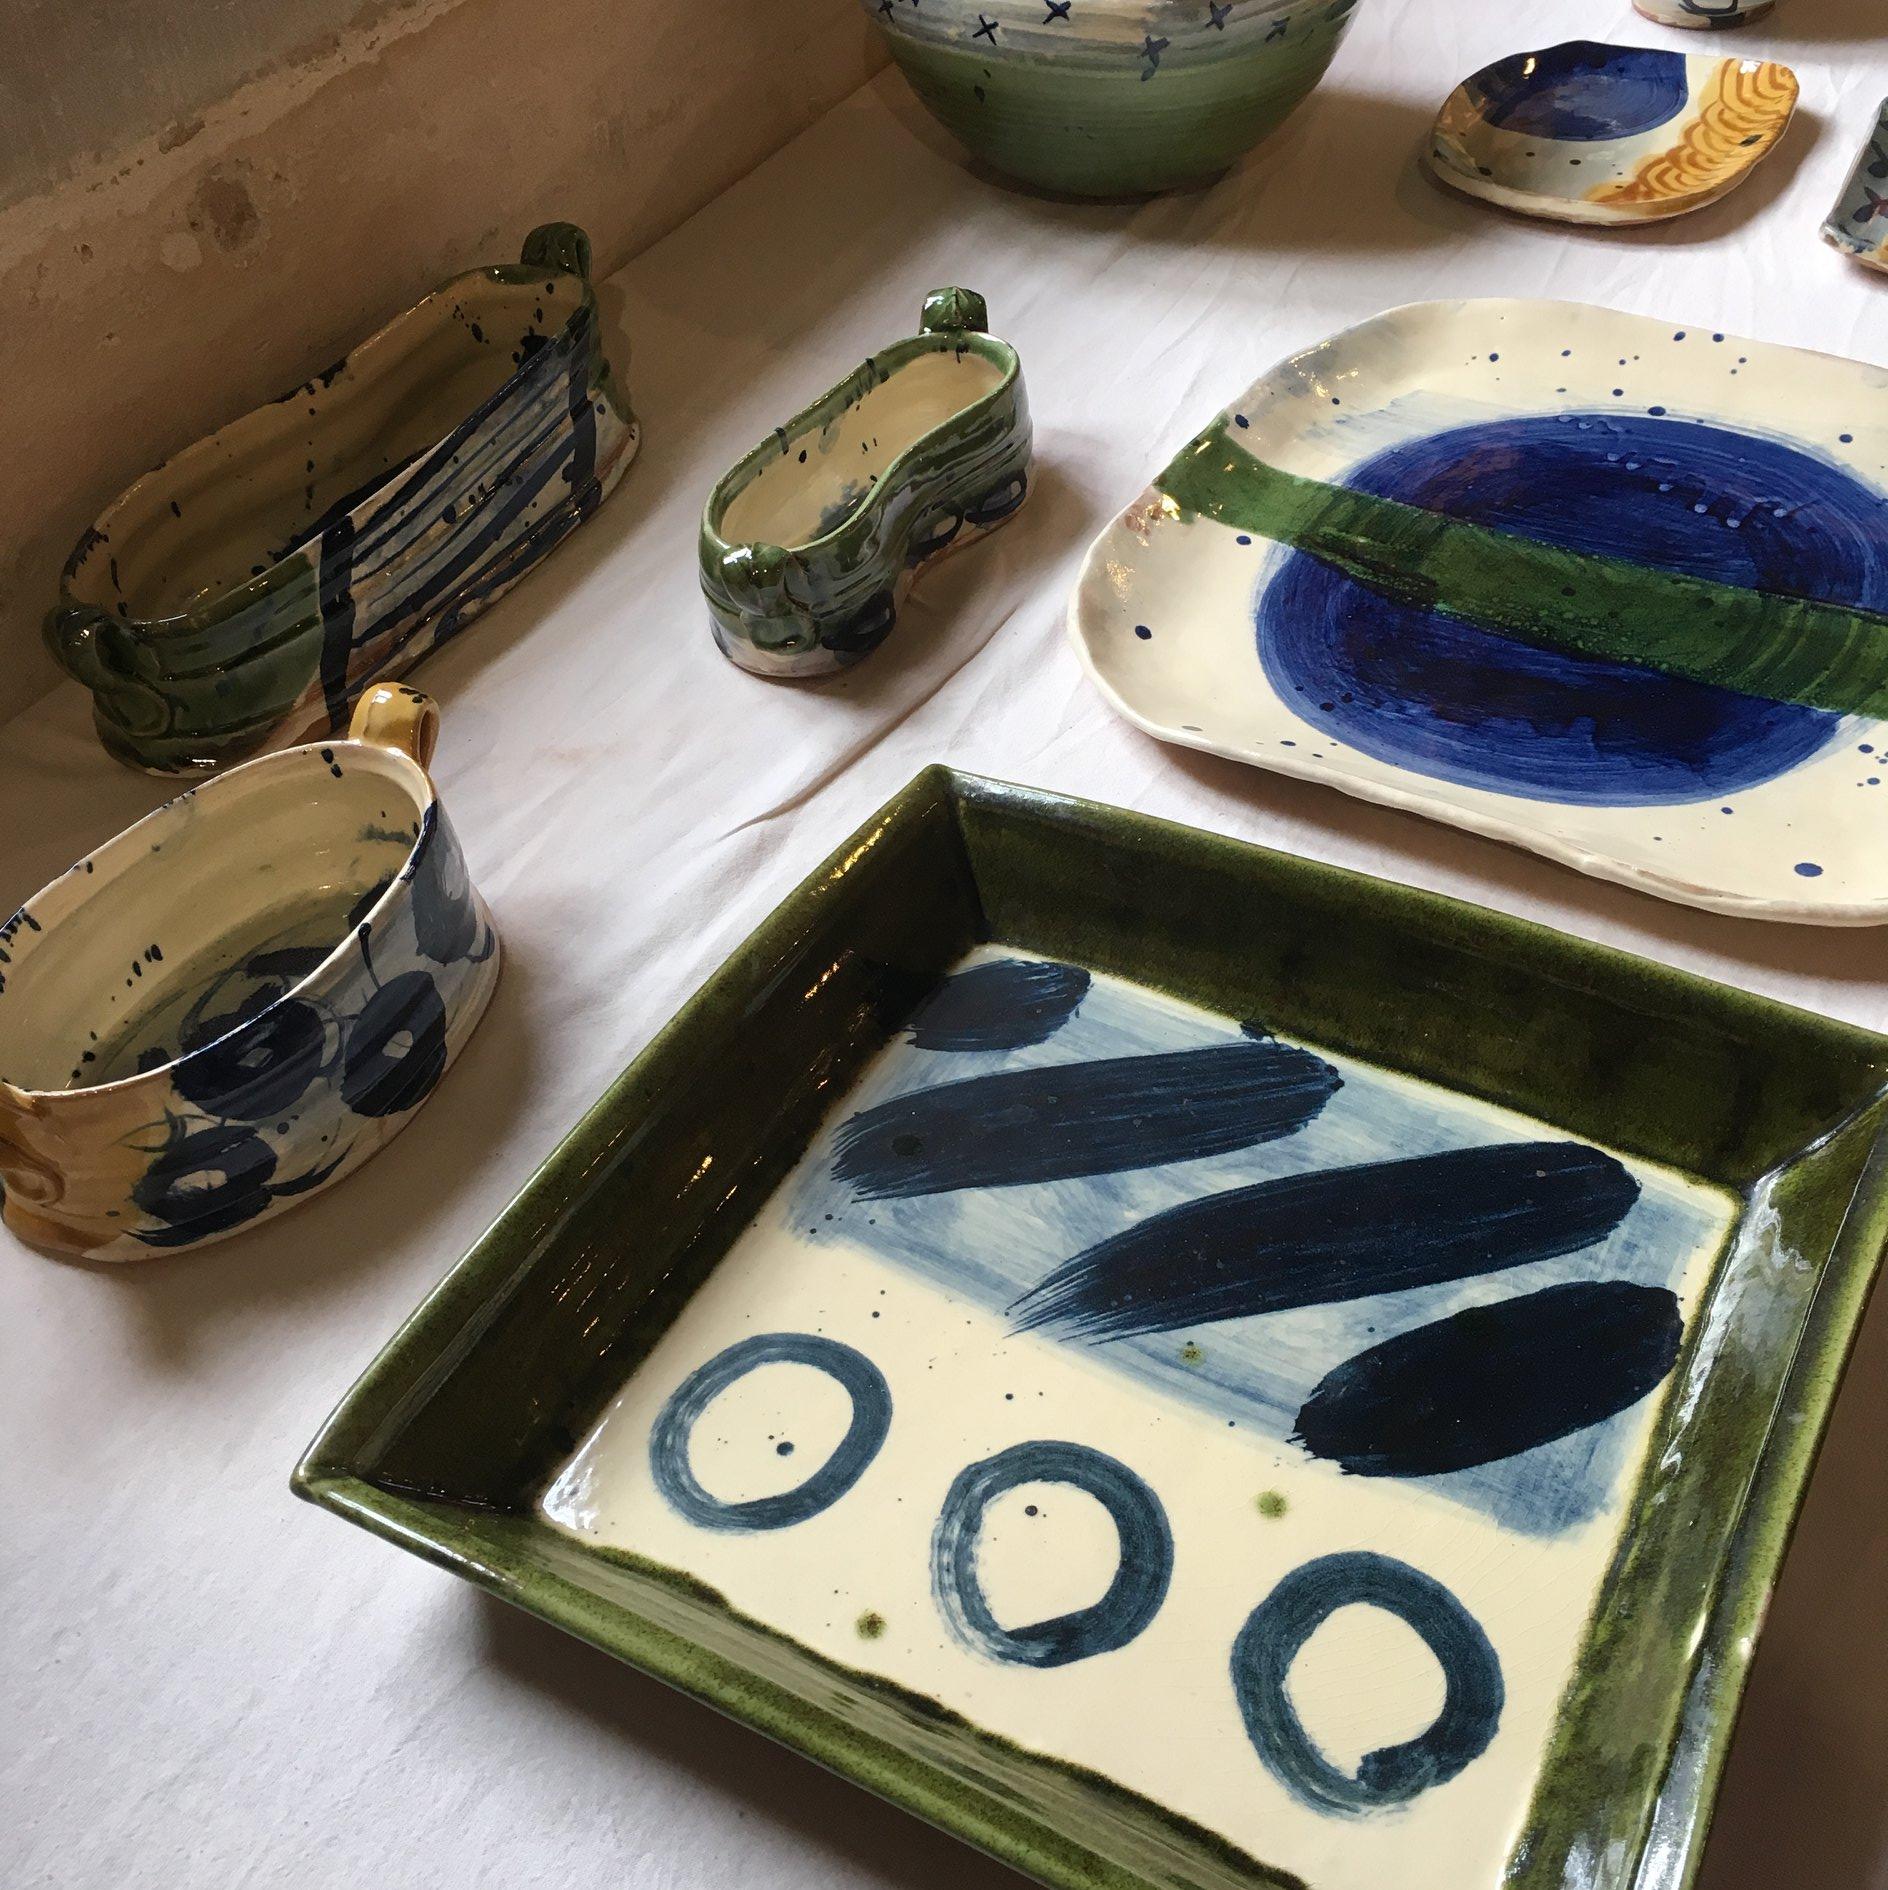 Ceramics by Nigel Lambert